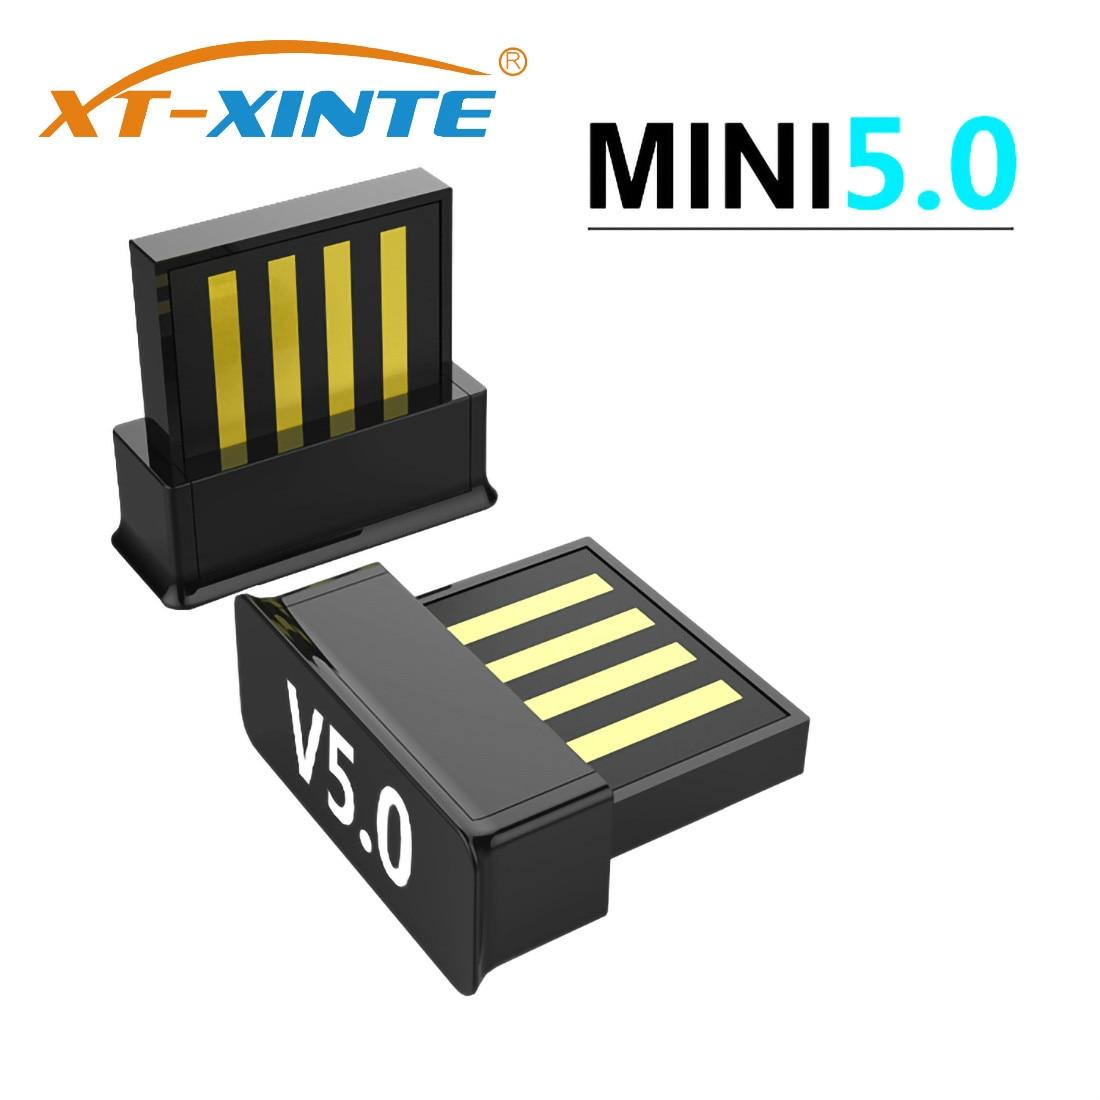 Mini USB Bluetooth Adapter 5.0 High Speed Stabilit Subwoofer Amplifier Multimedia Audio Adapter блютус адаптер